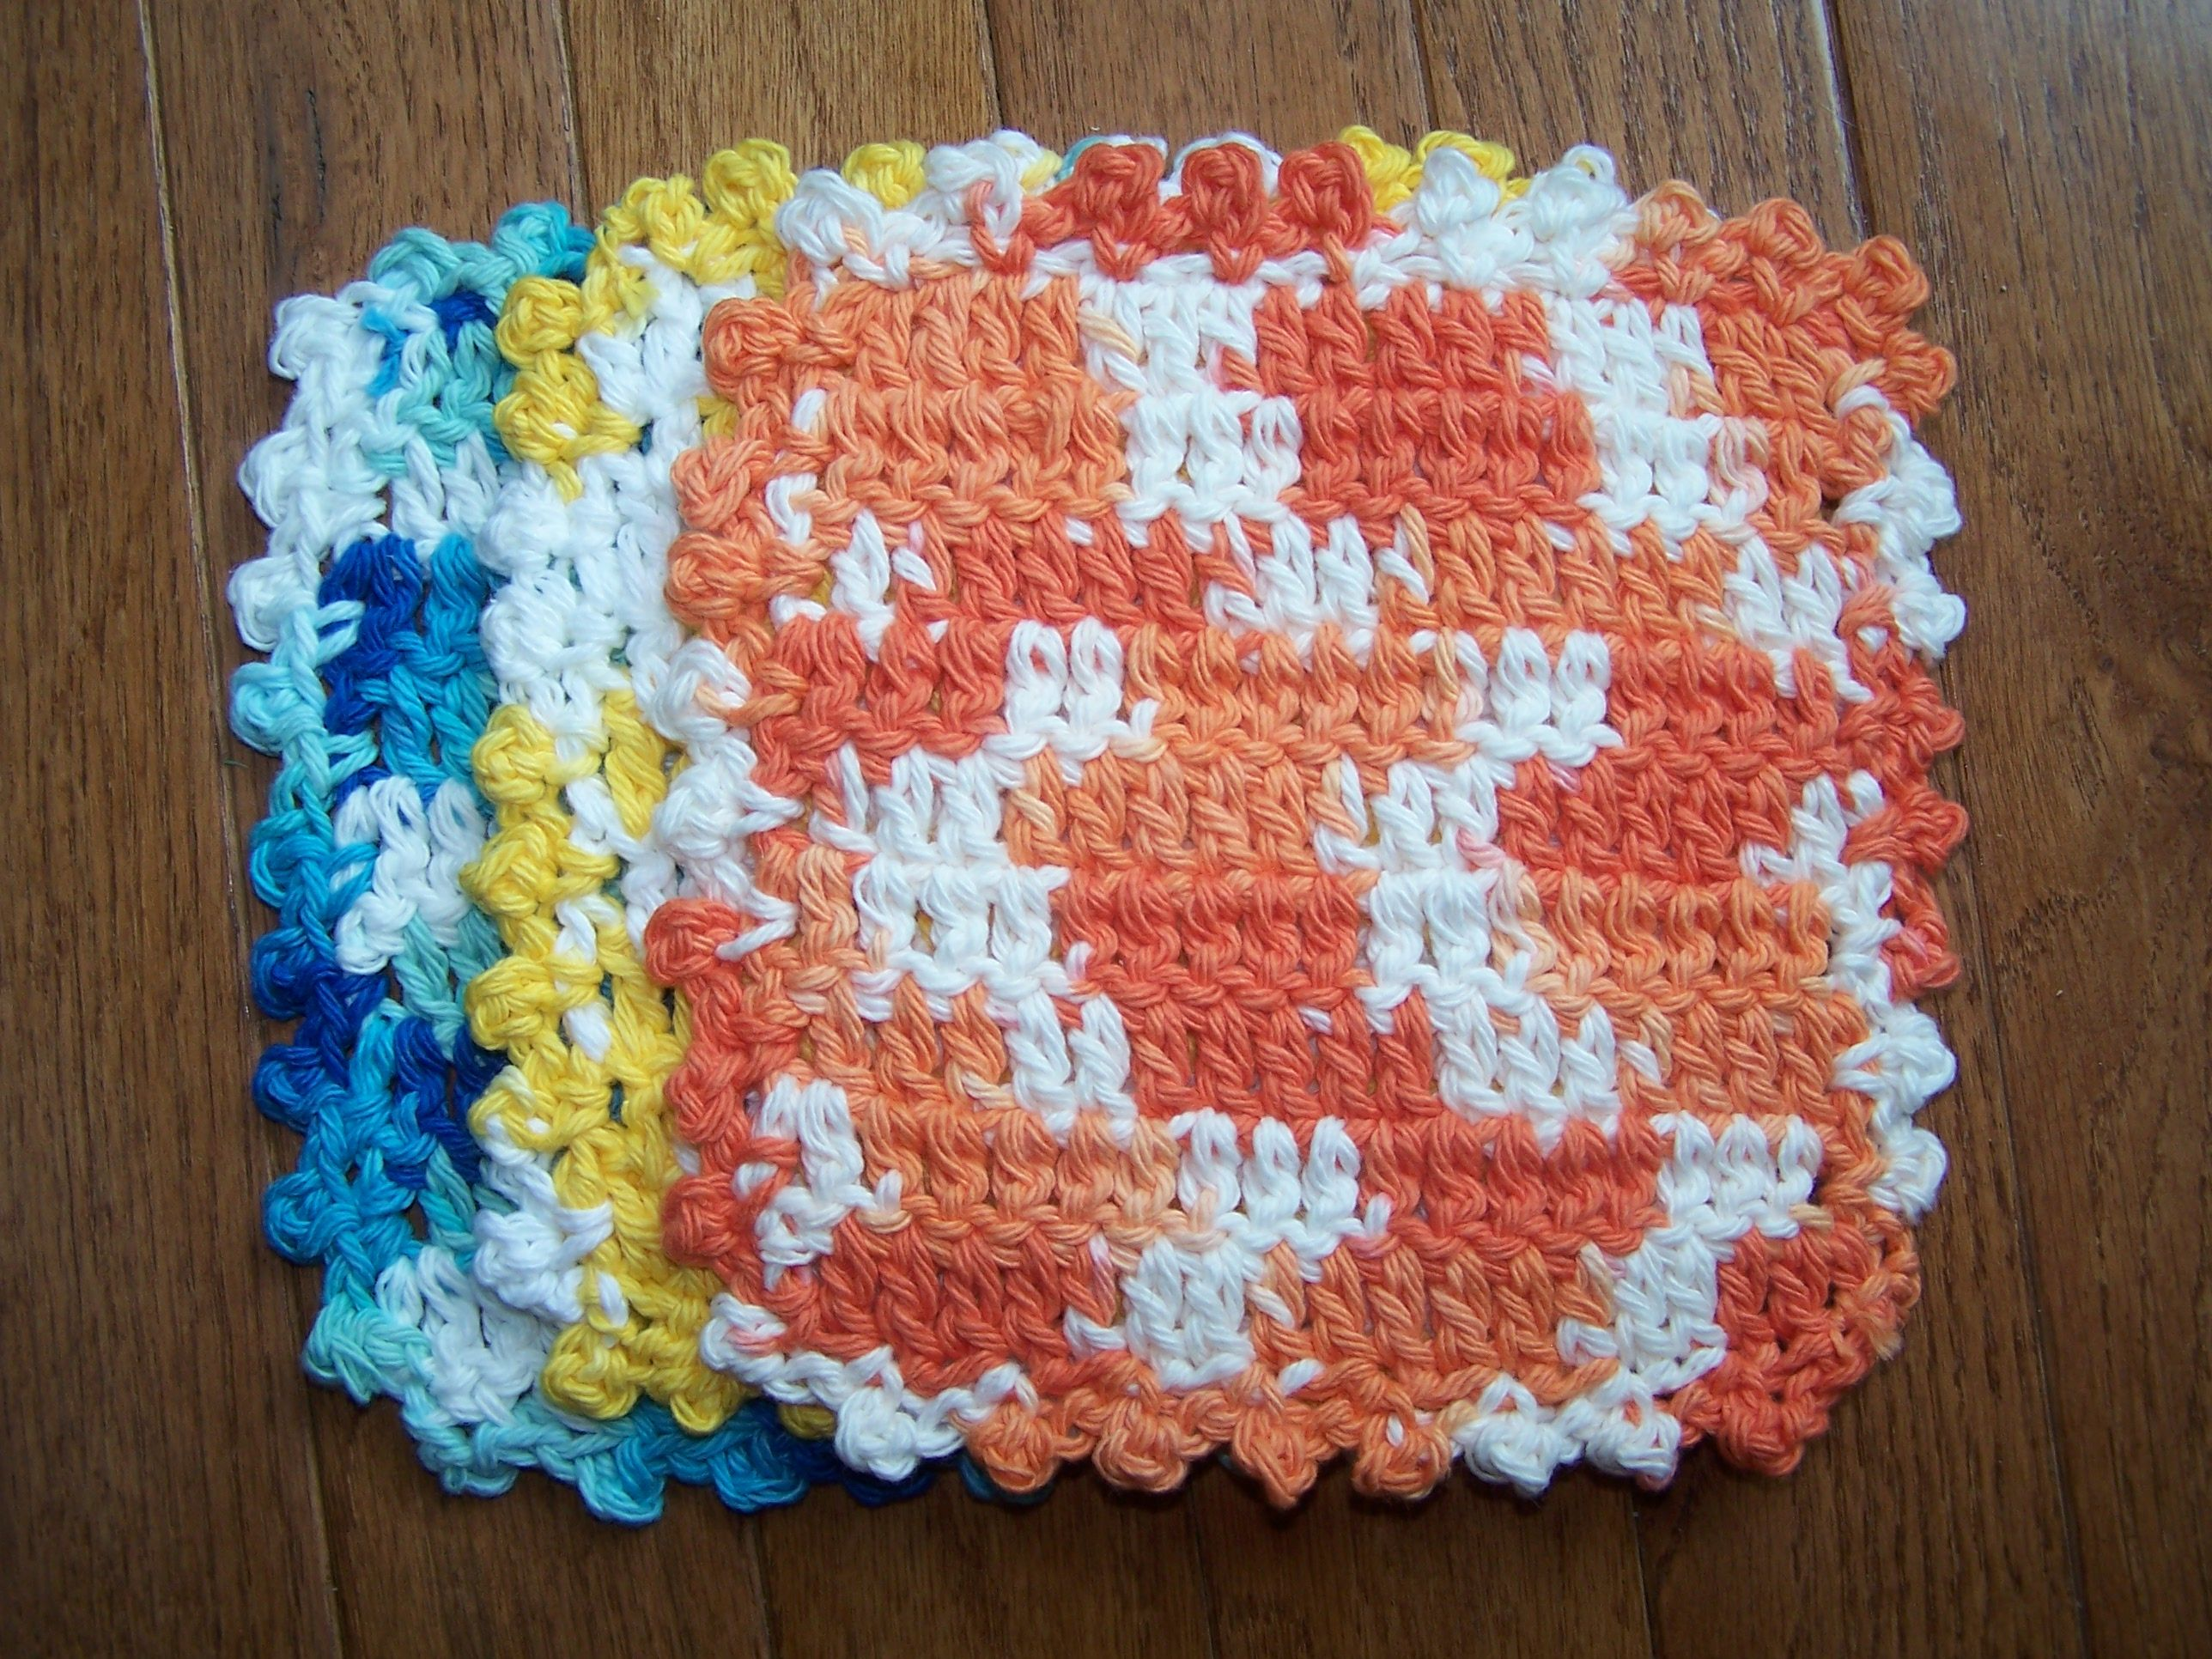 Crochet dish rags made from Peaches & Cream or Sugars & Cream cotton ...